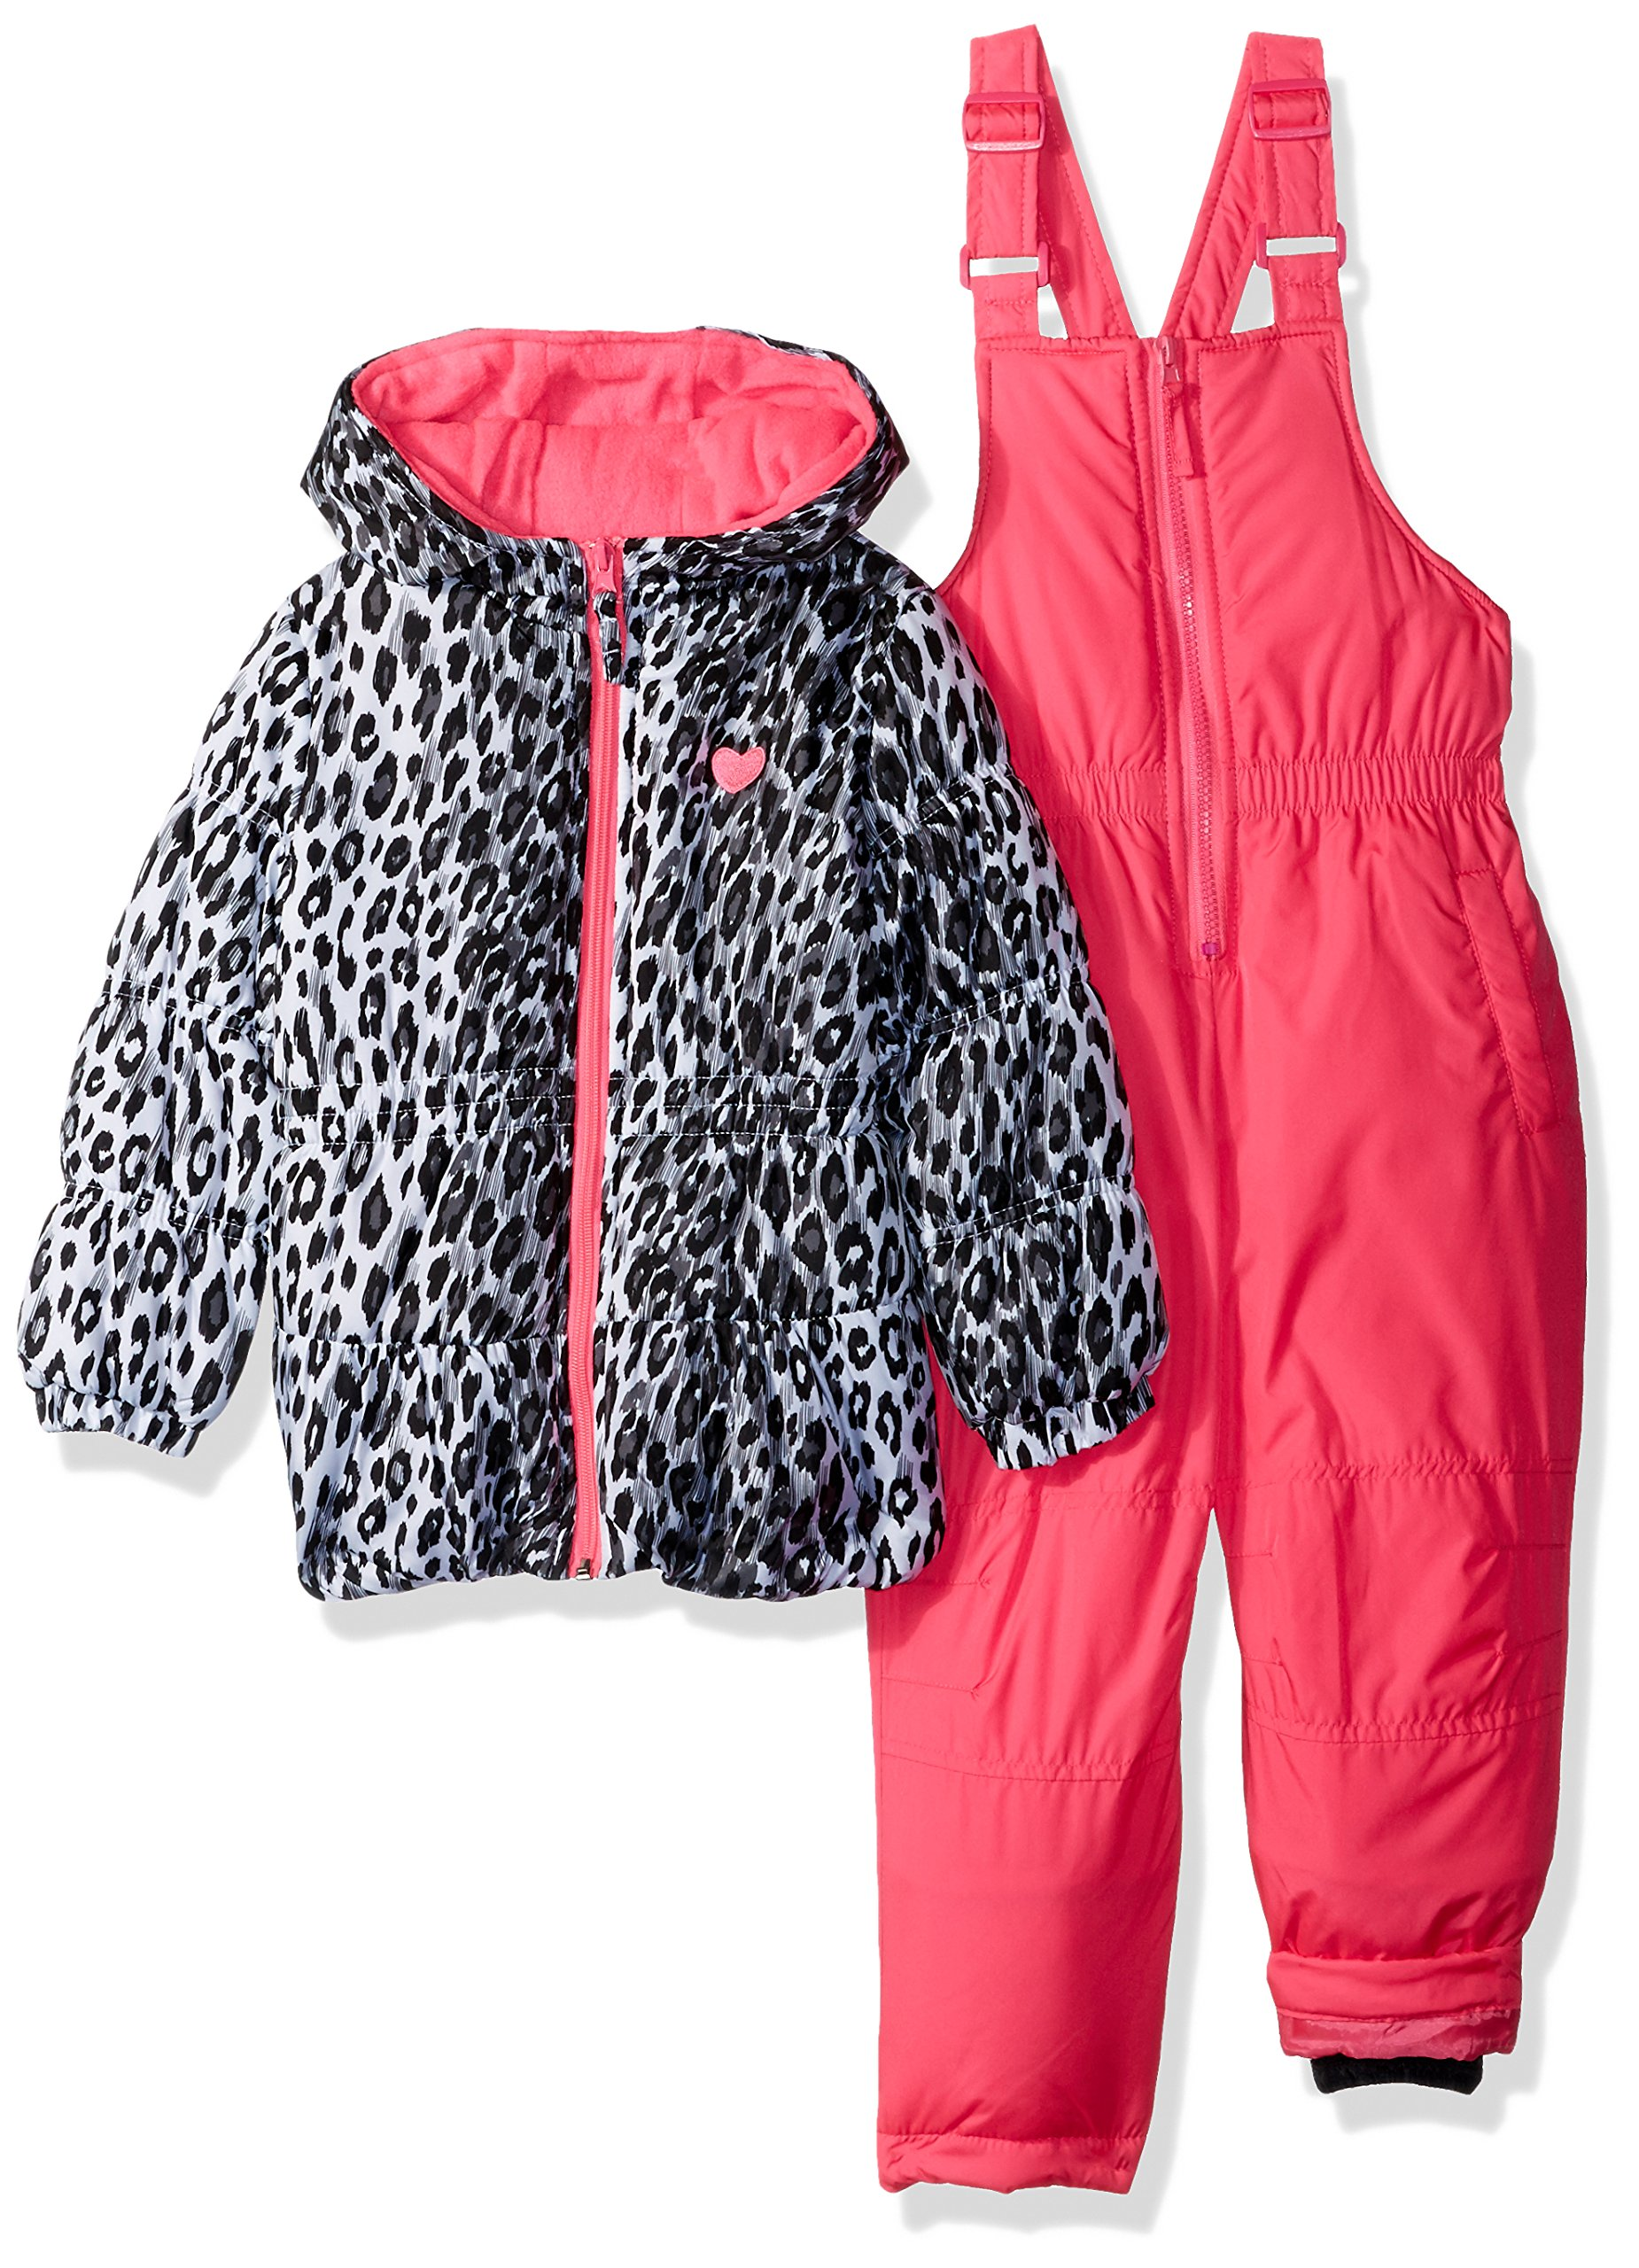 Pink Platinum Little Girls' Printed Super Snowsuit, Pink Cheetah, 4